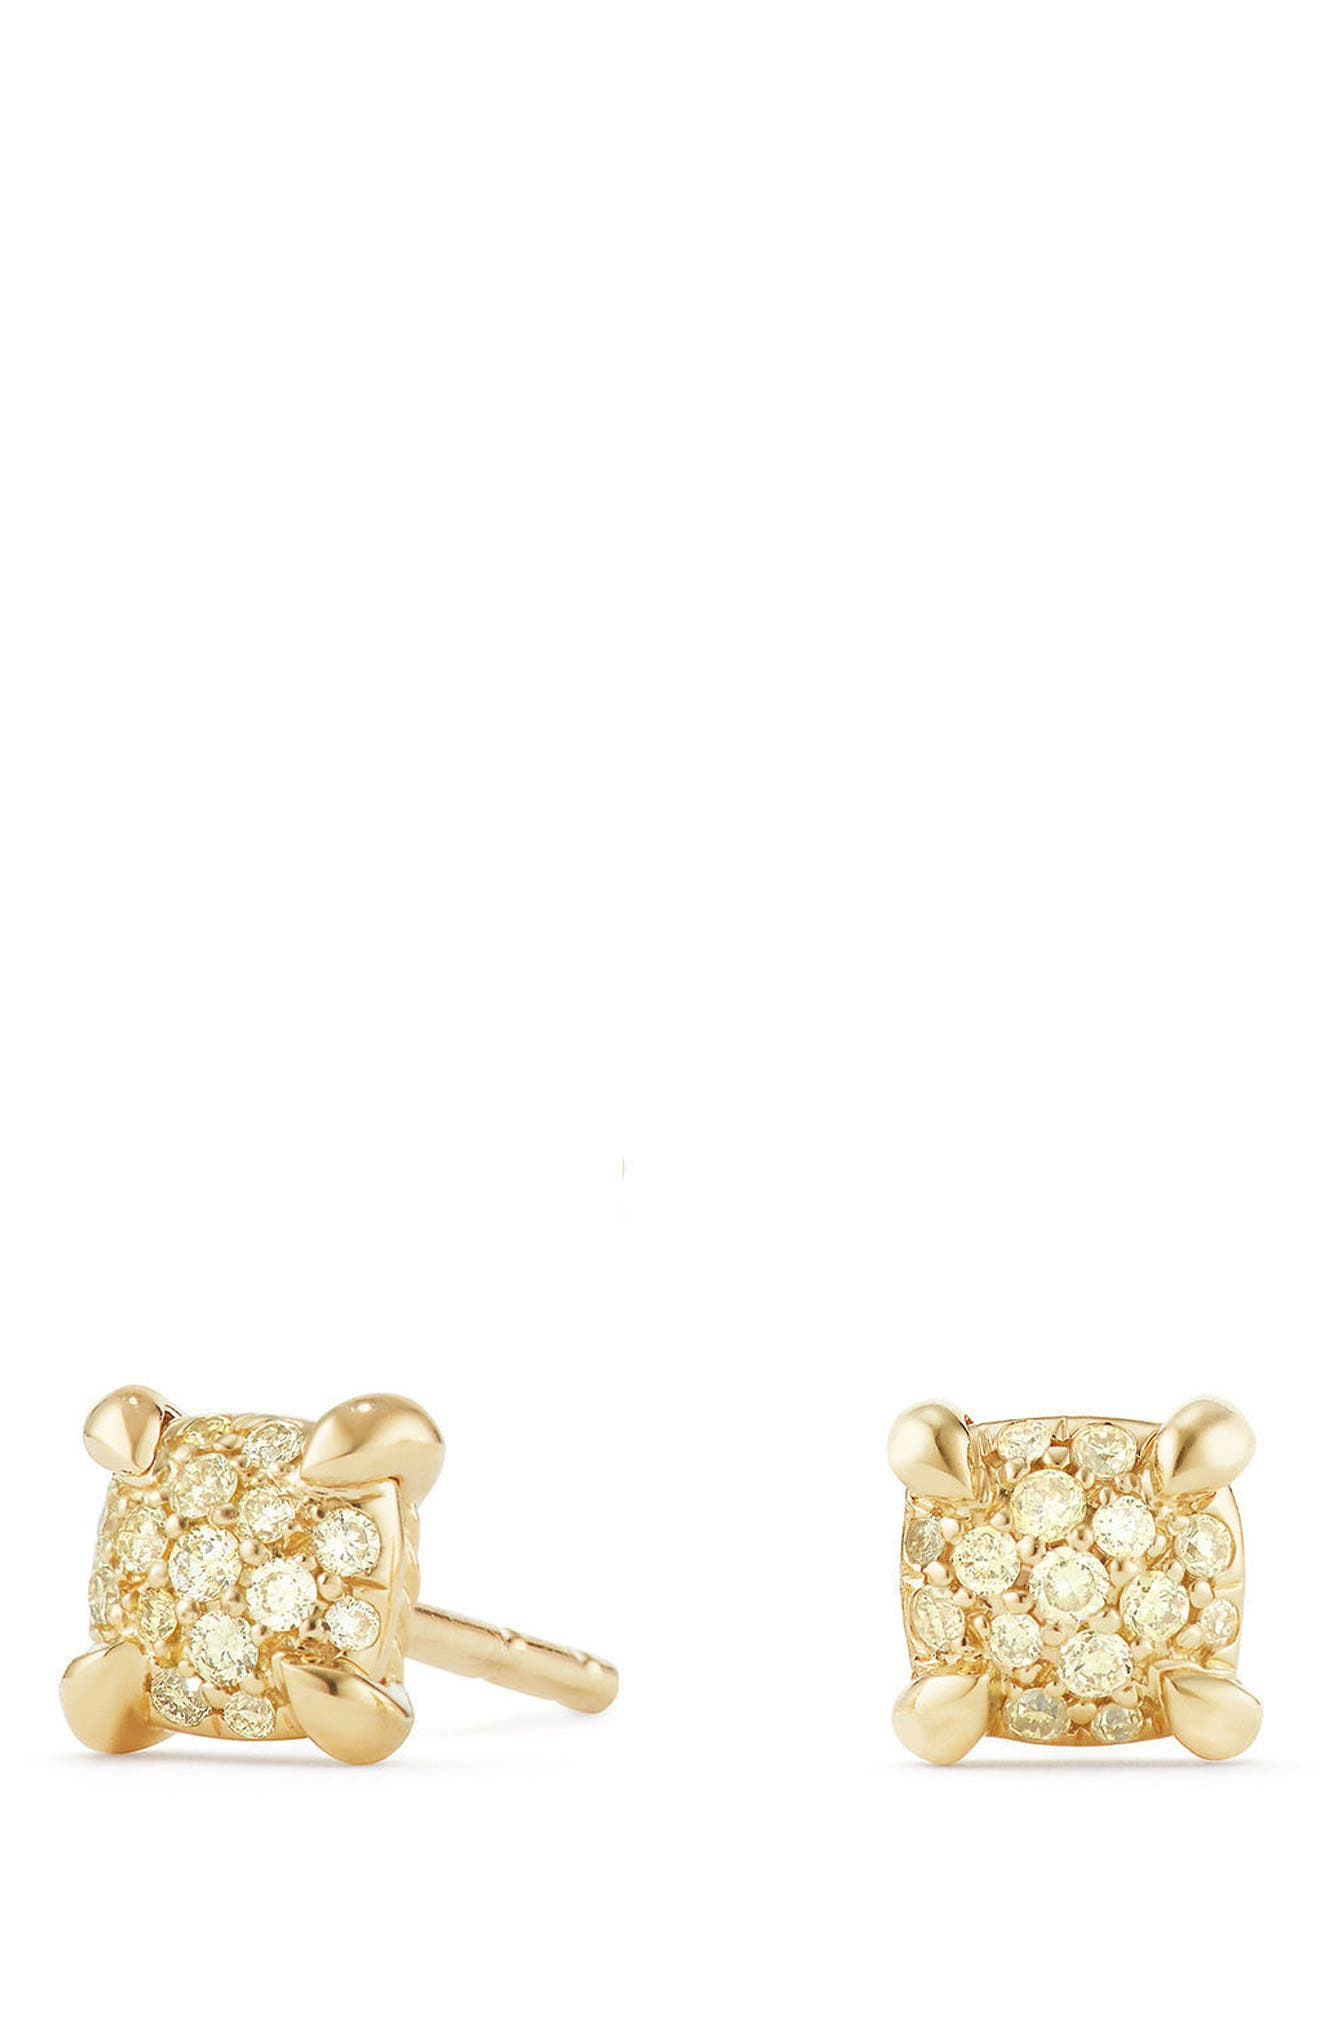 Main Image - David Yurman Châtelaine Stud Earrings with Diamonds